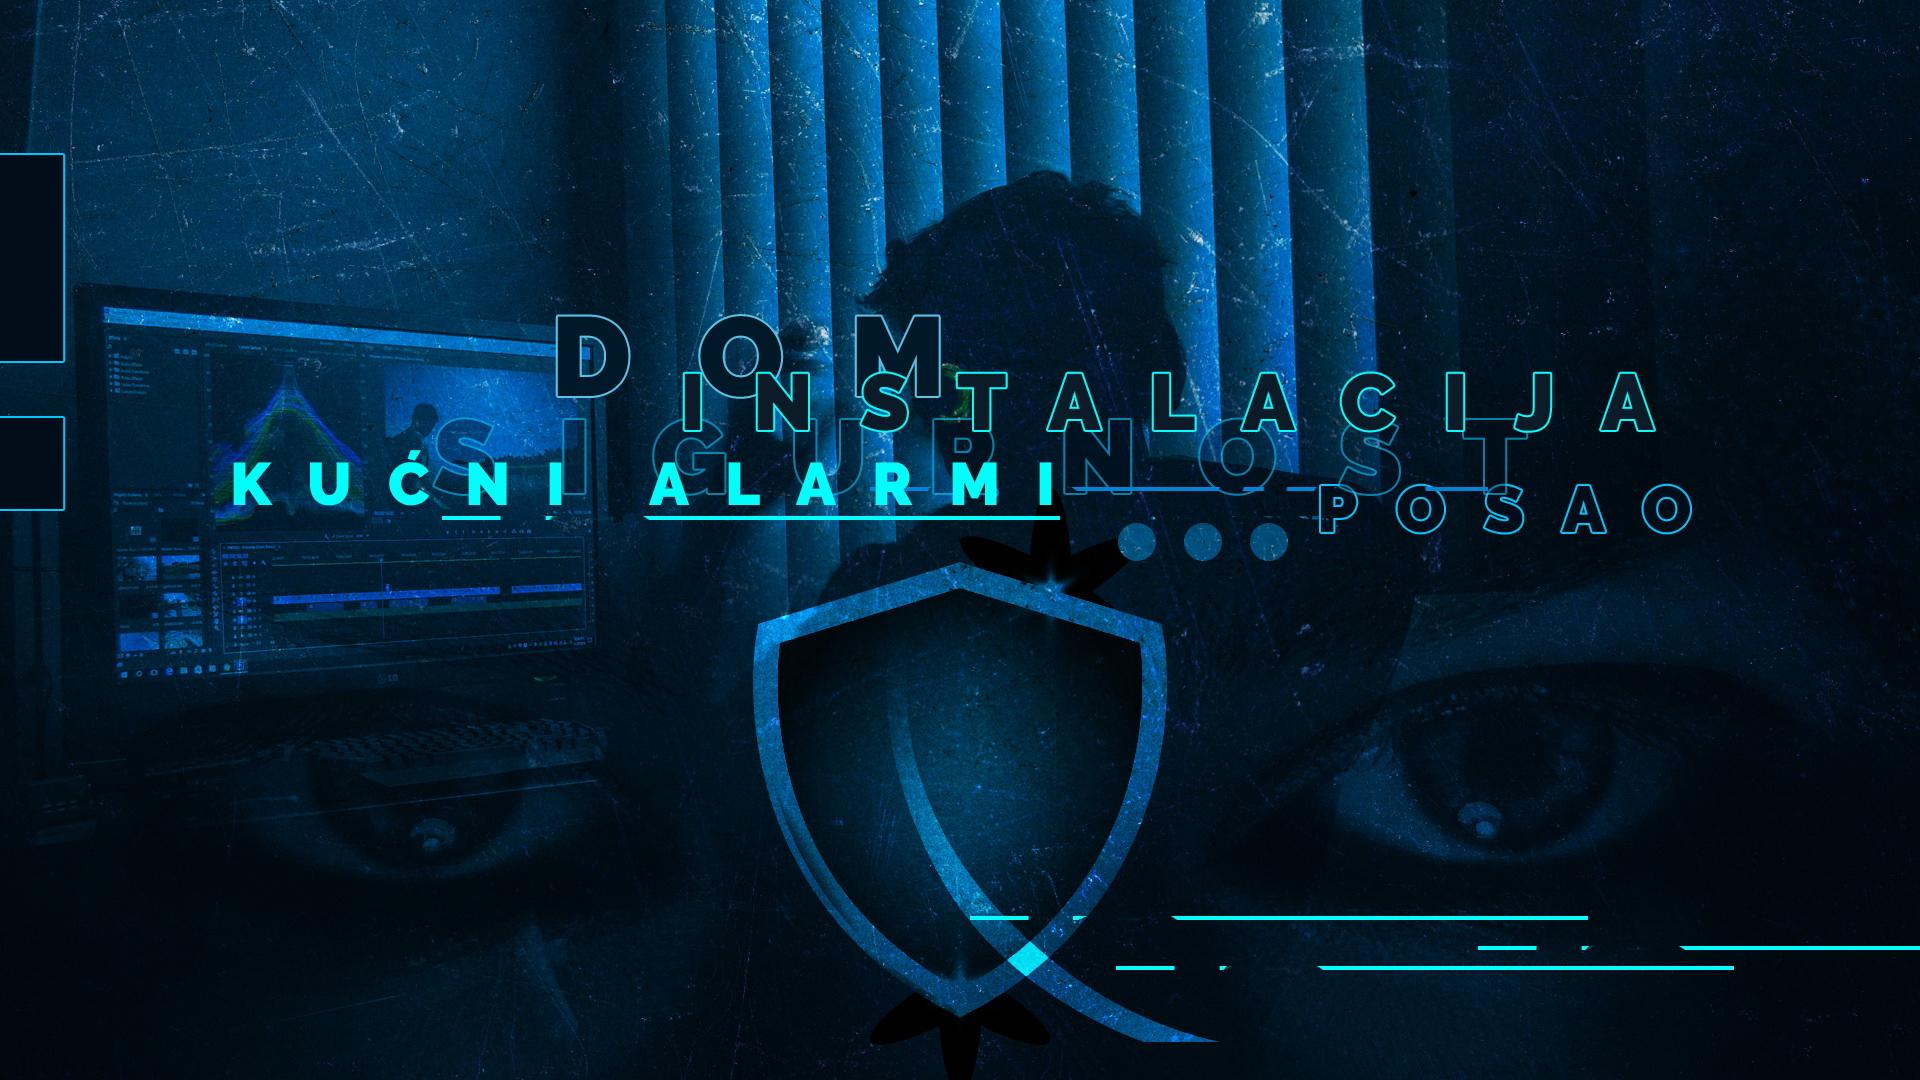 Kućni alarmi